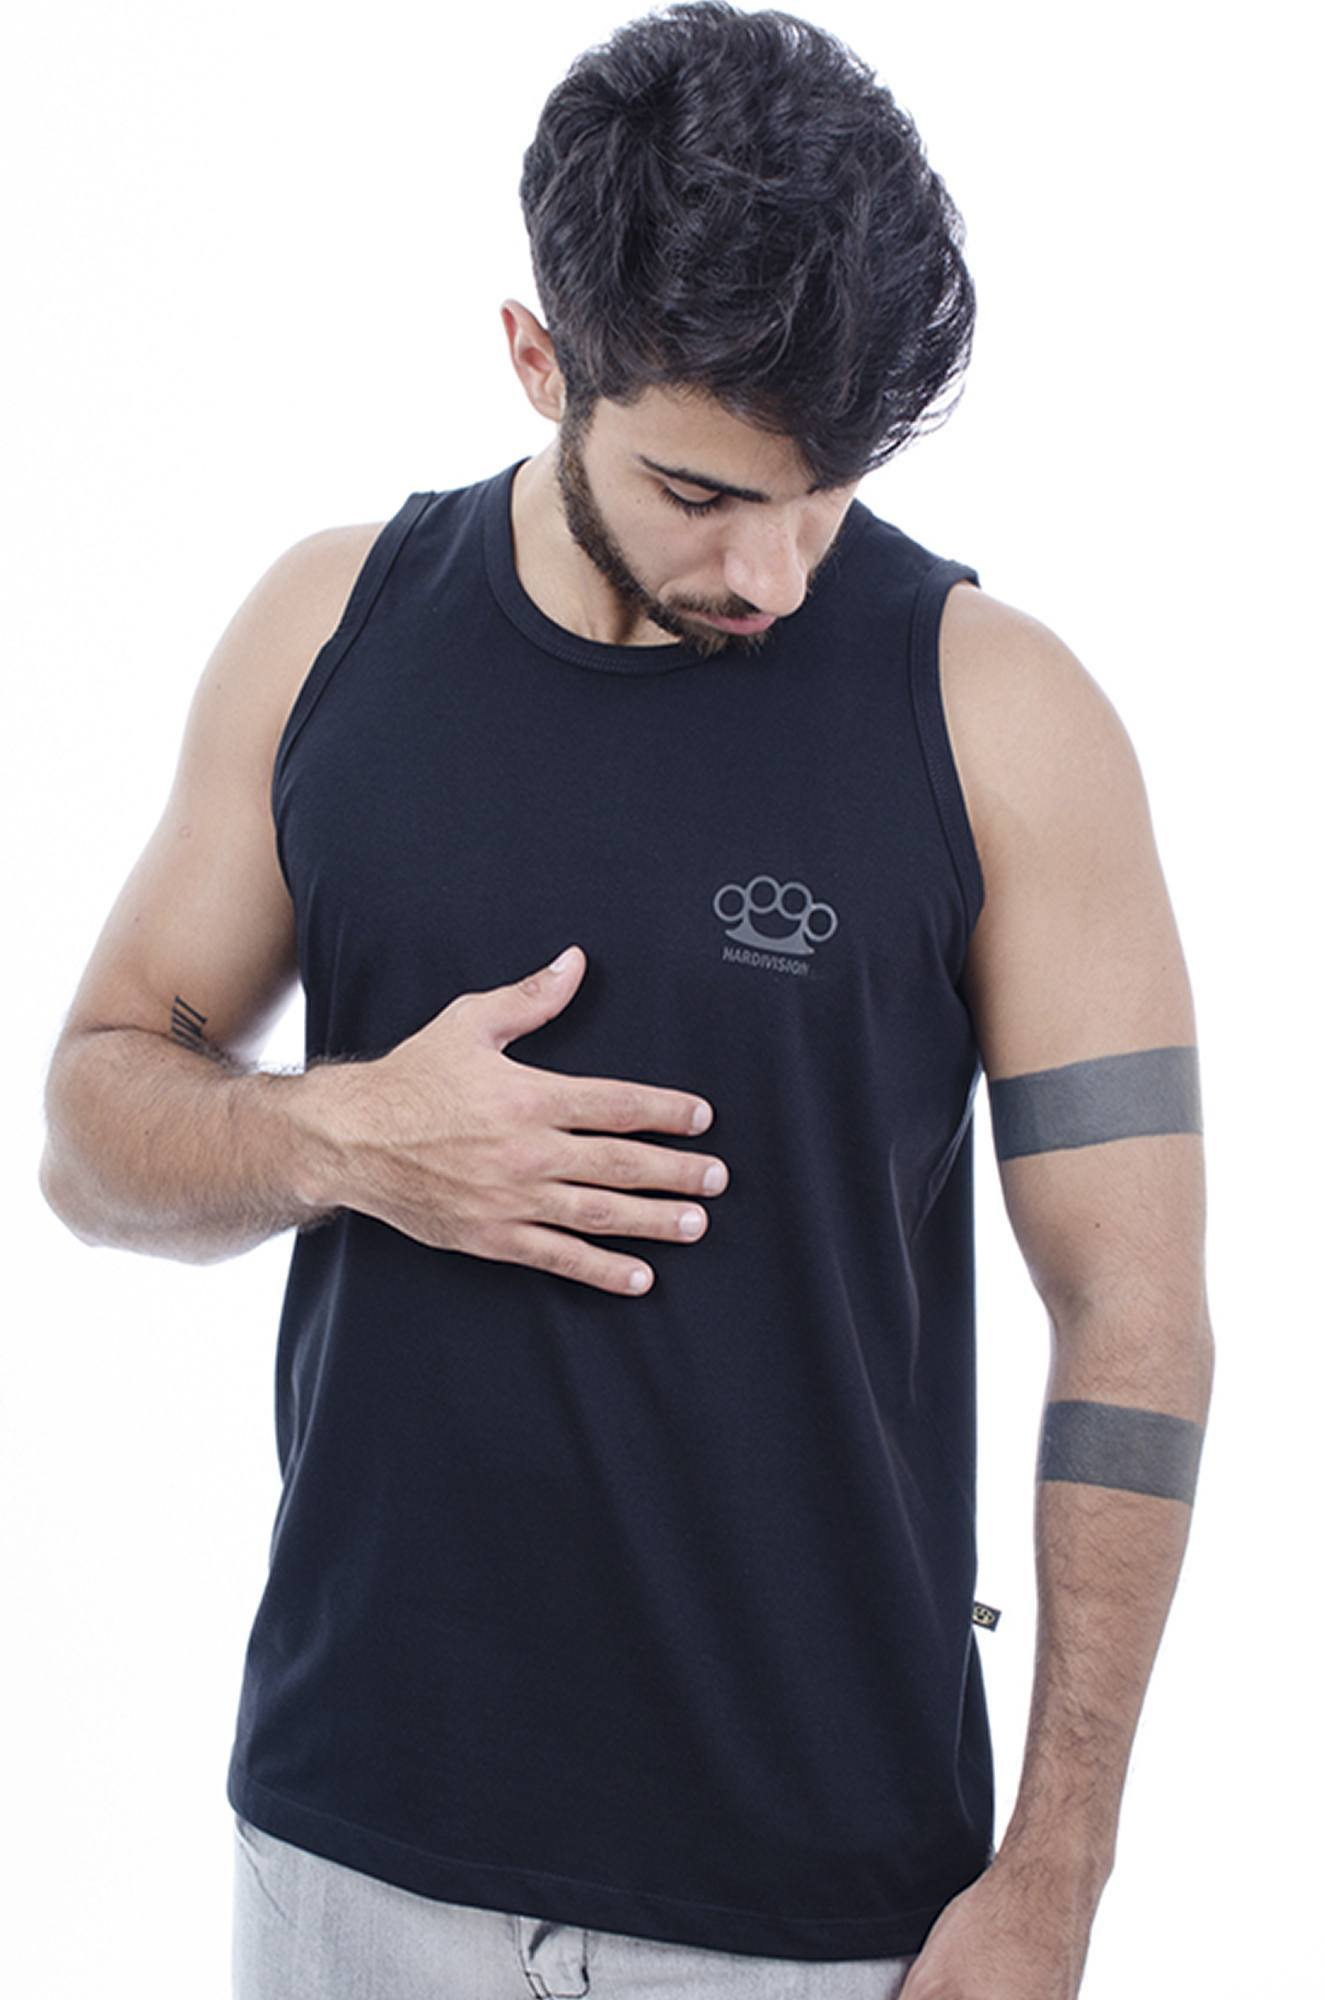 Camiseta Regata Masculina Hardivision Simple Preto